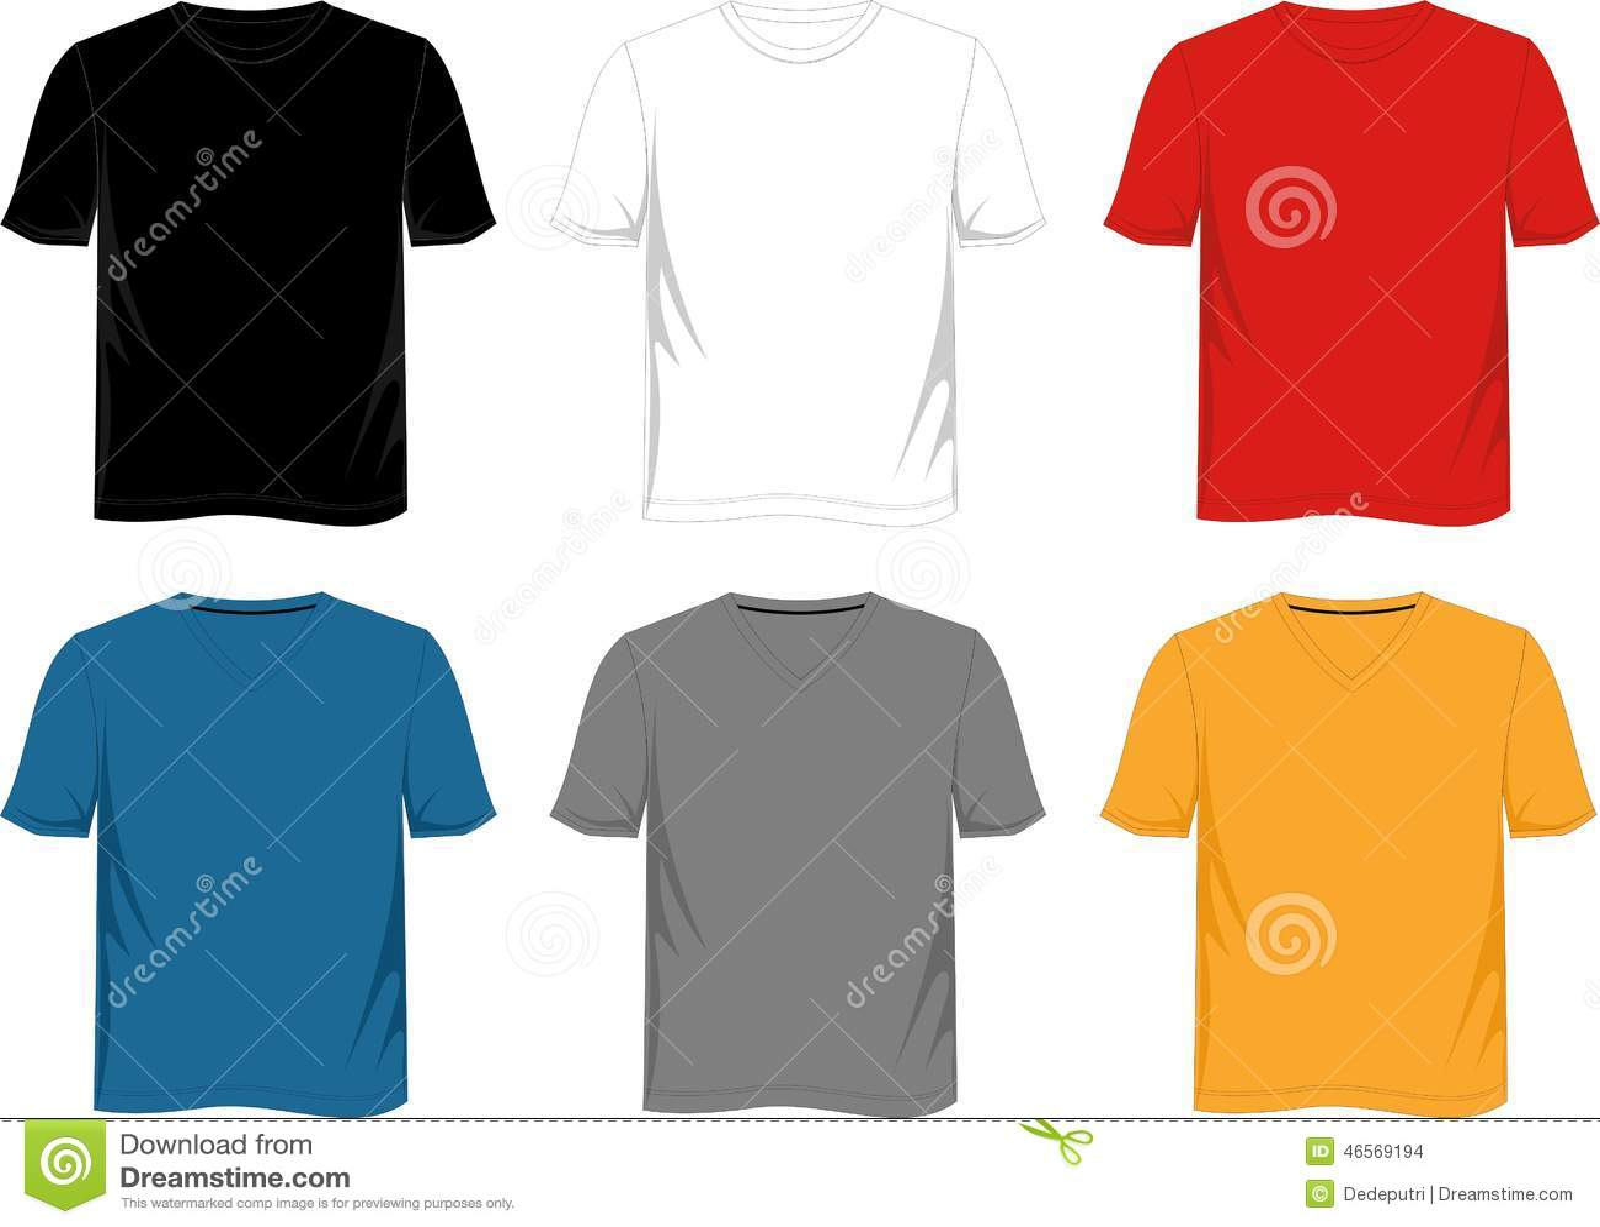 Black t shirt template - Black Gray Red Shirt Template